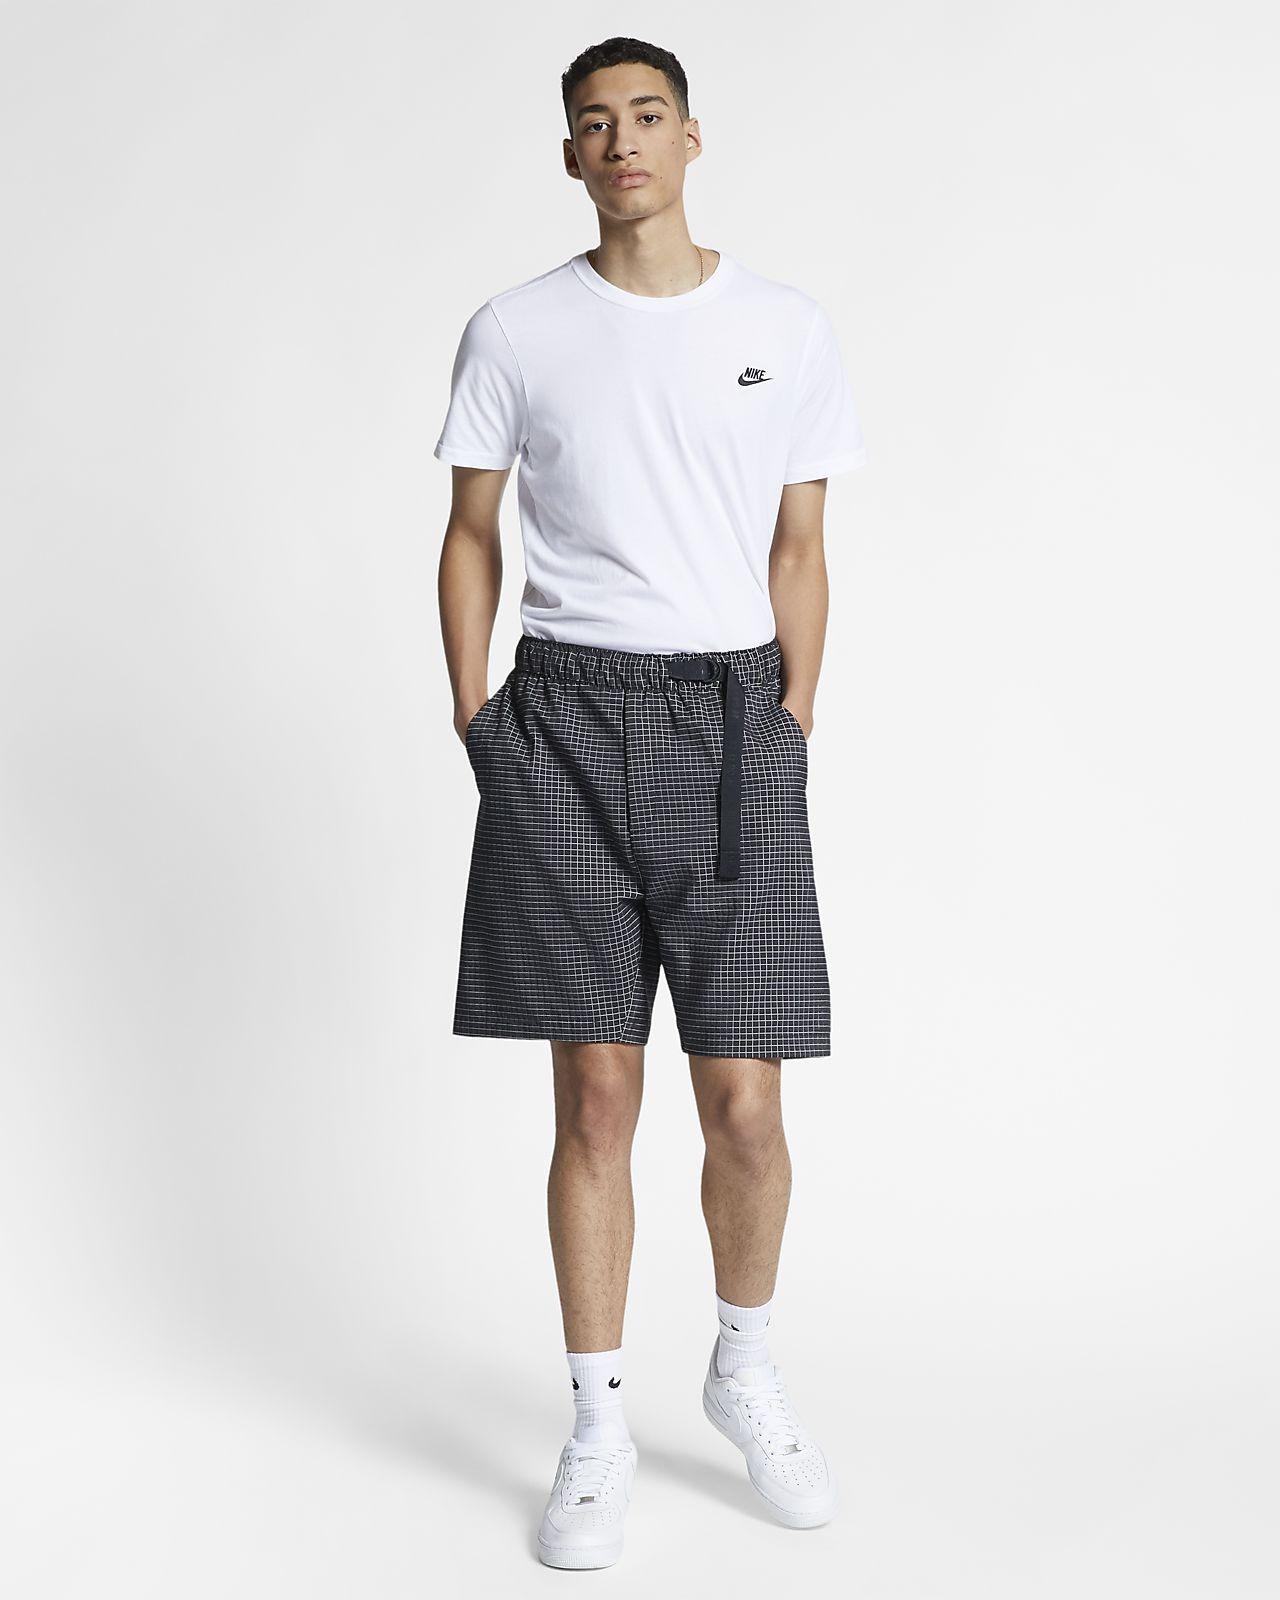 Sportswear Shorts Tech Nike Pack Woven tsdhrCxQ